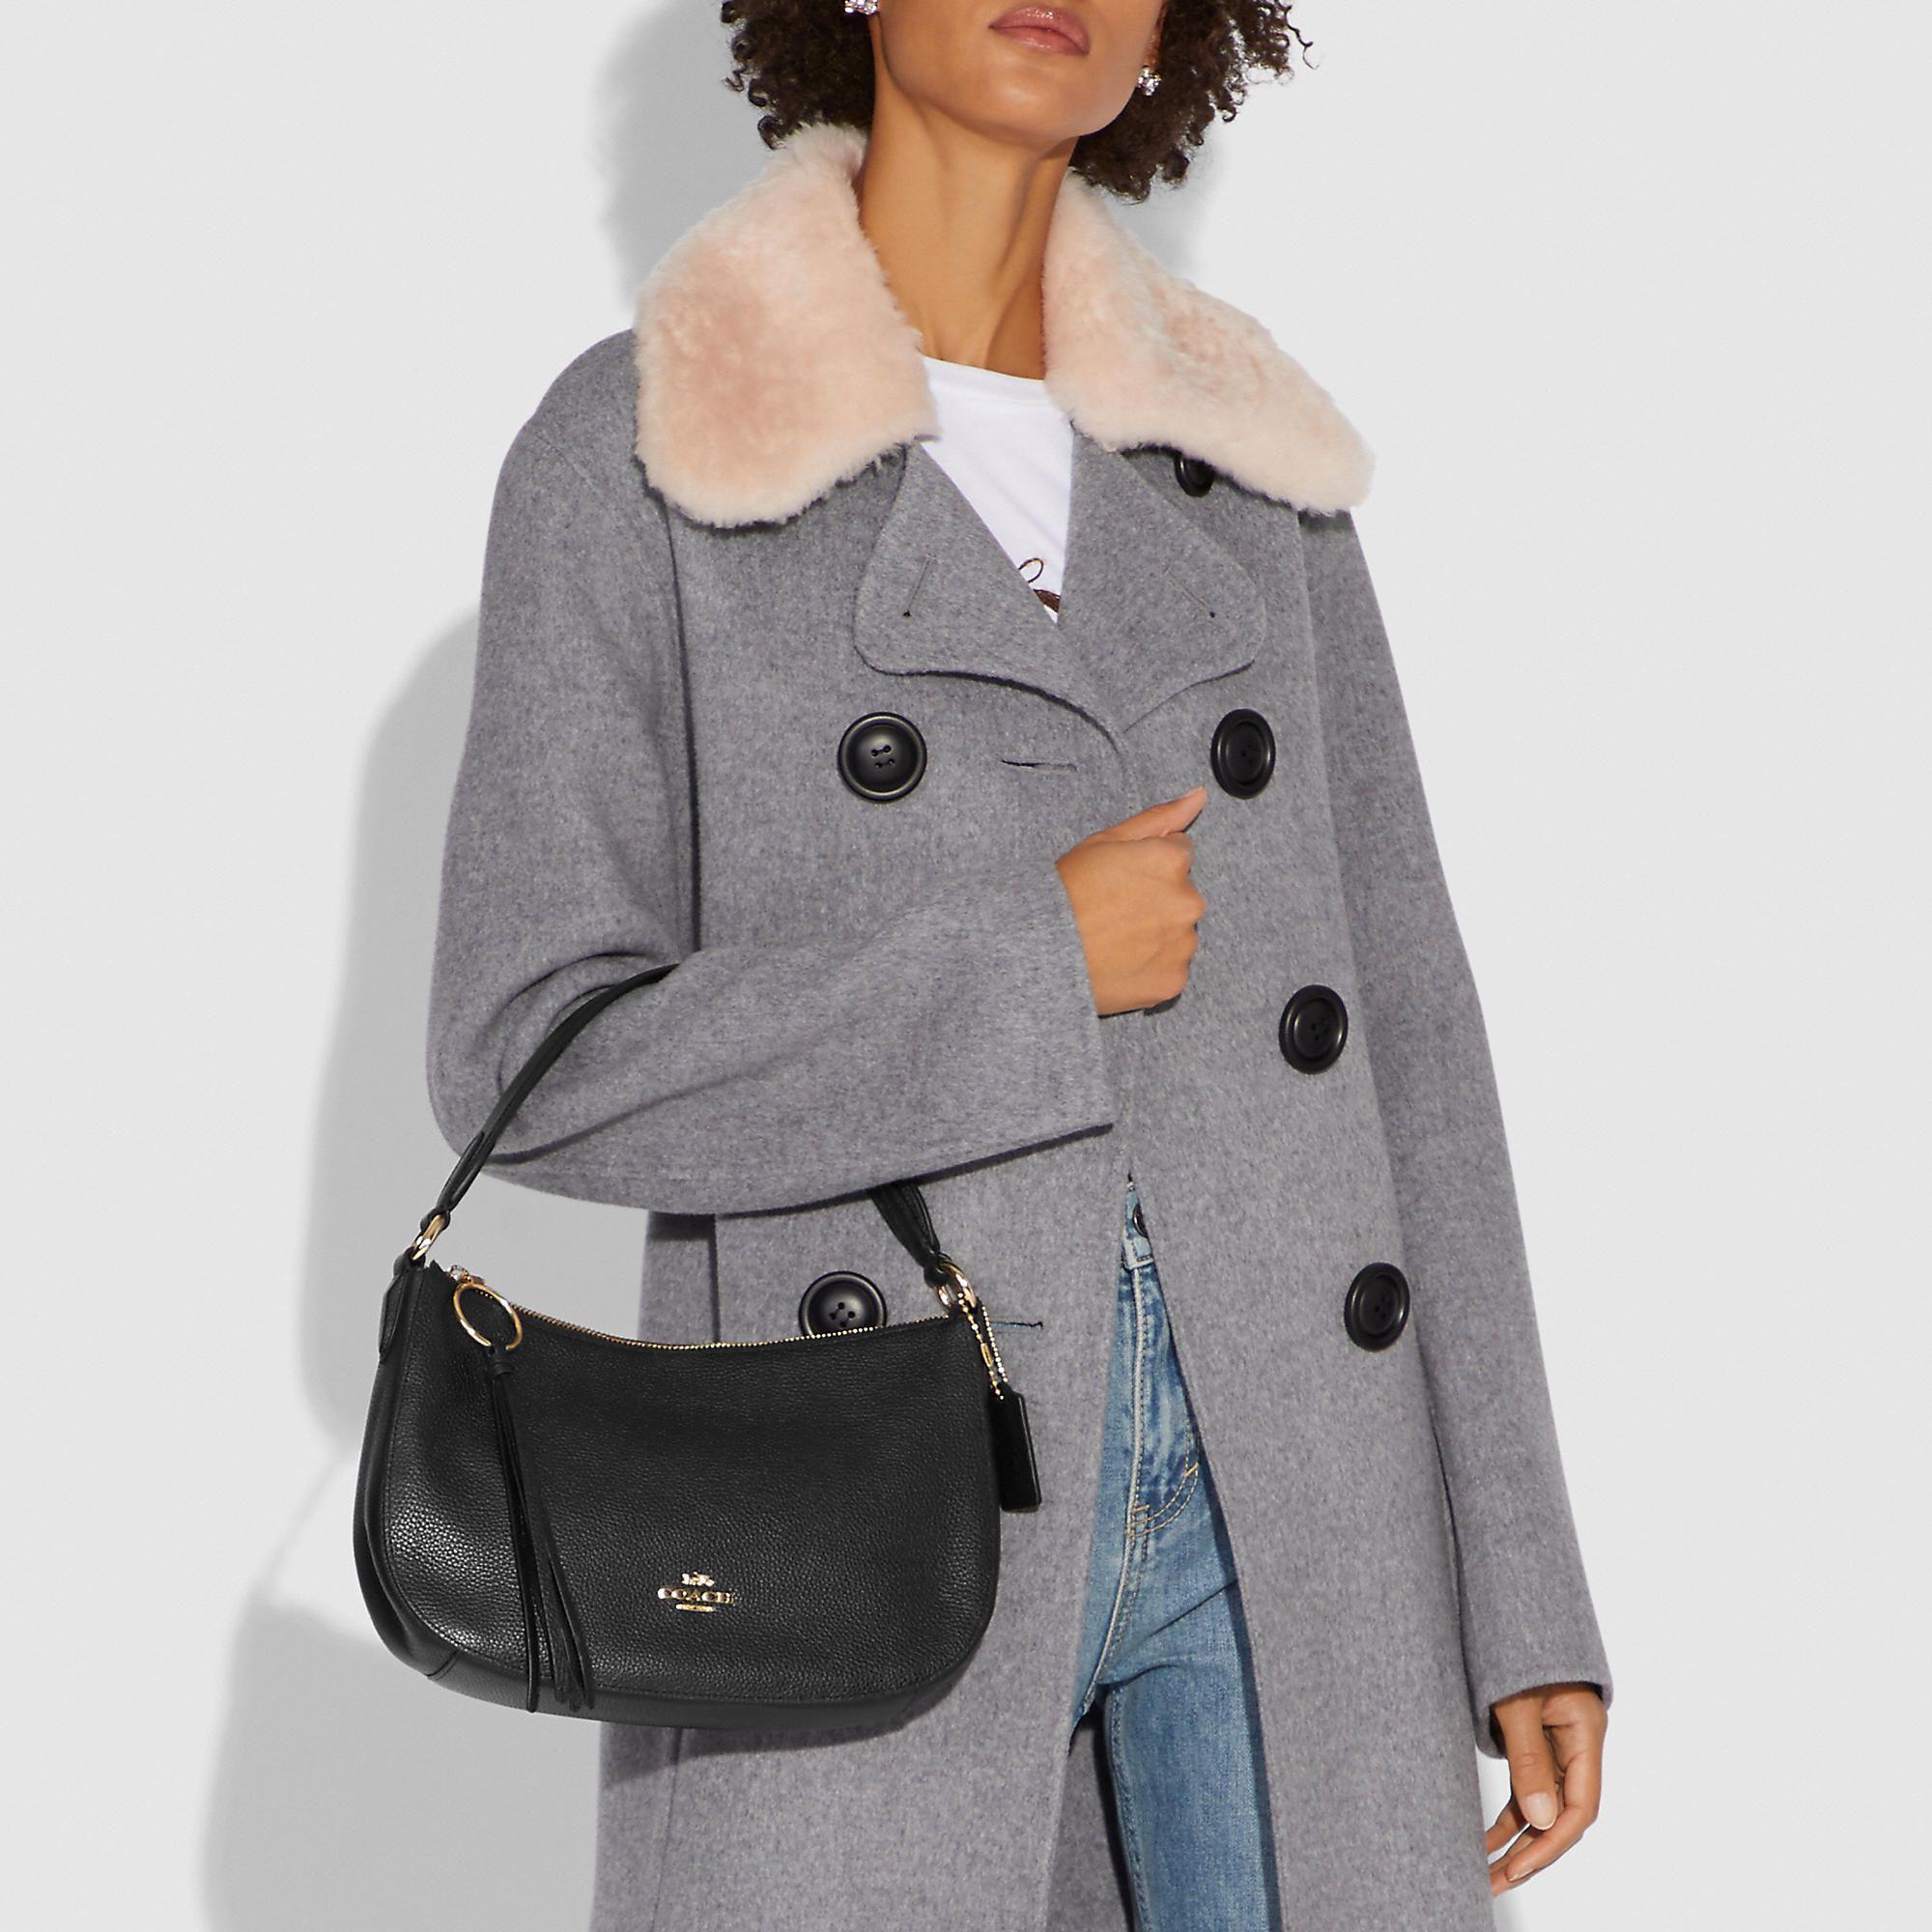 038d79e01cfa COACH Sutton Crossbody - Women's Designer Crossbody in 2019 ...